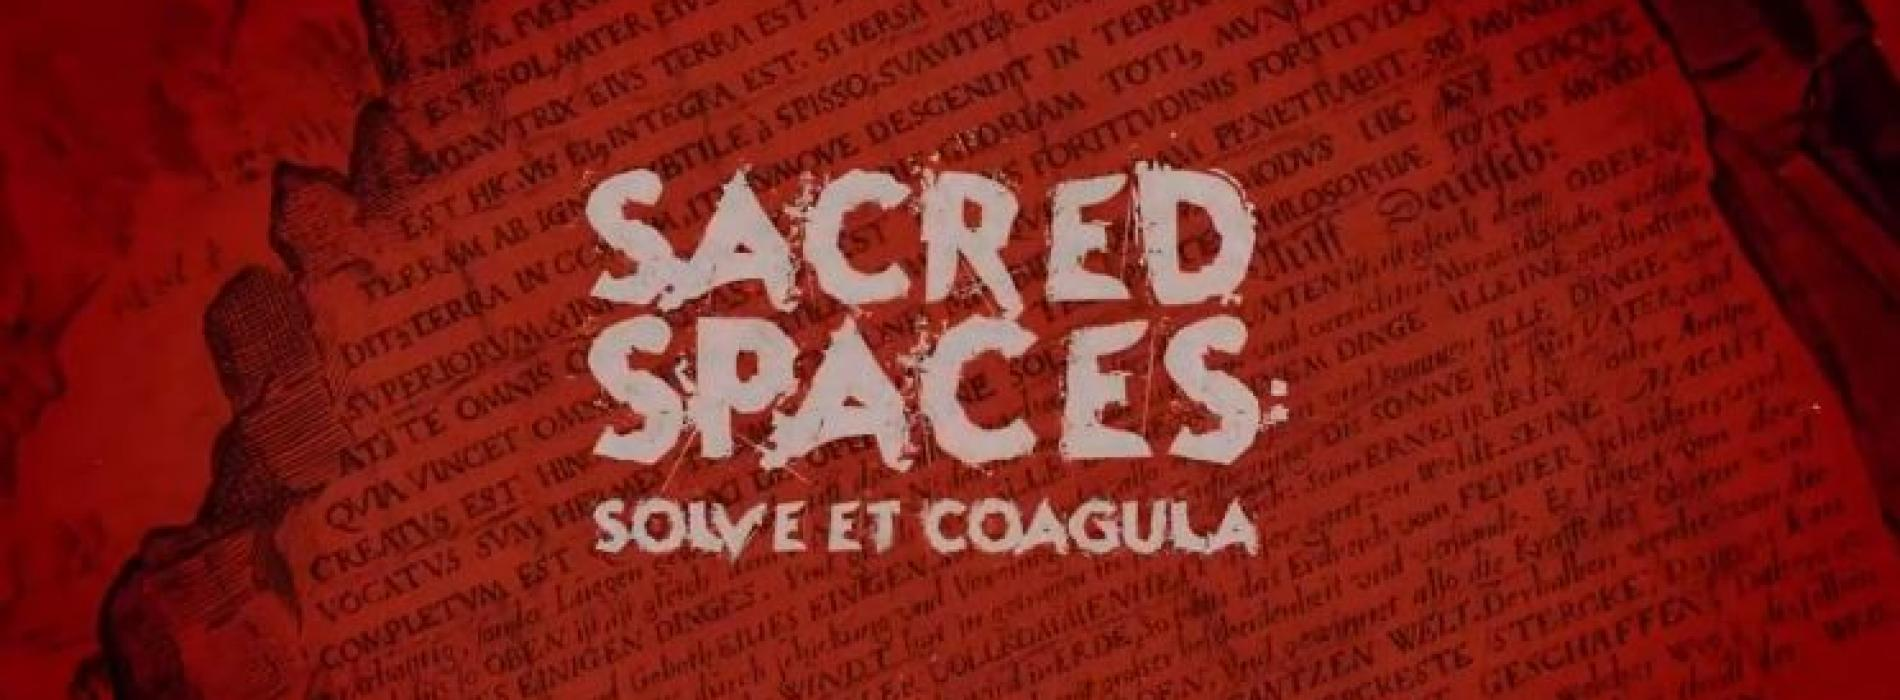 New Music : Stigmata – Sacred Spaces: Solve et Coagula (Official Music Video)